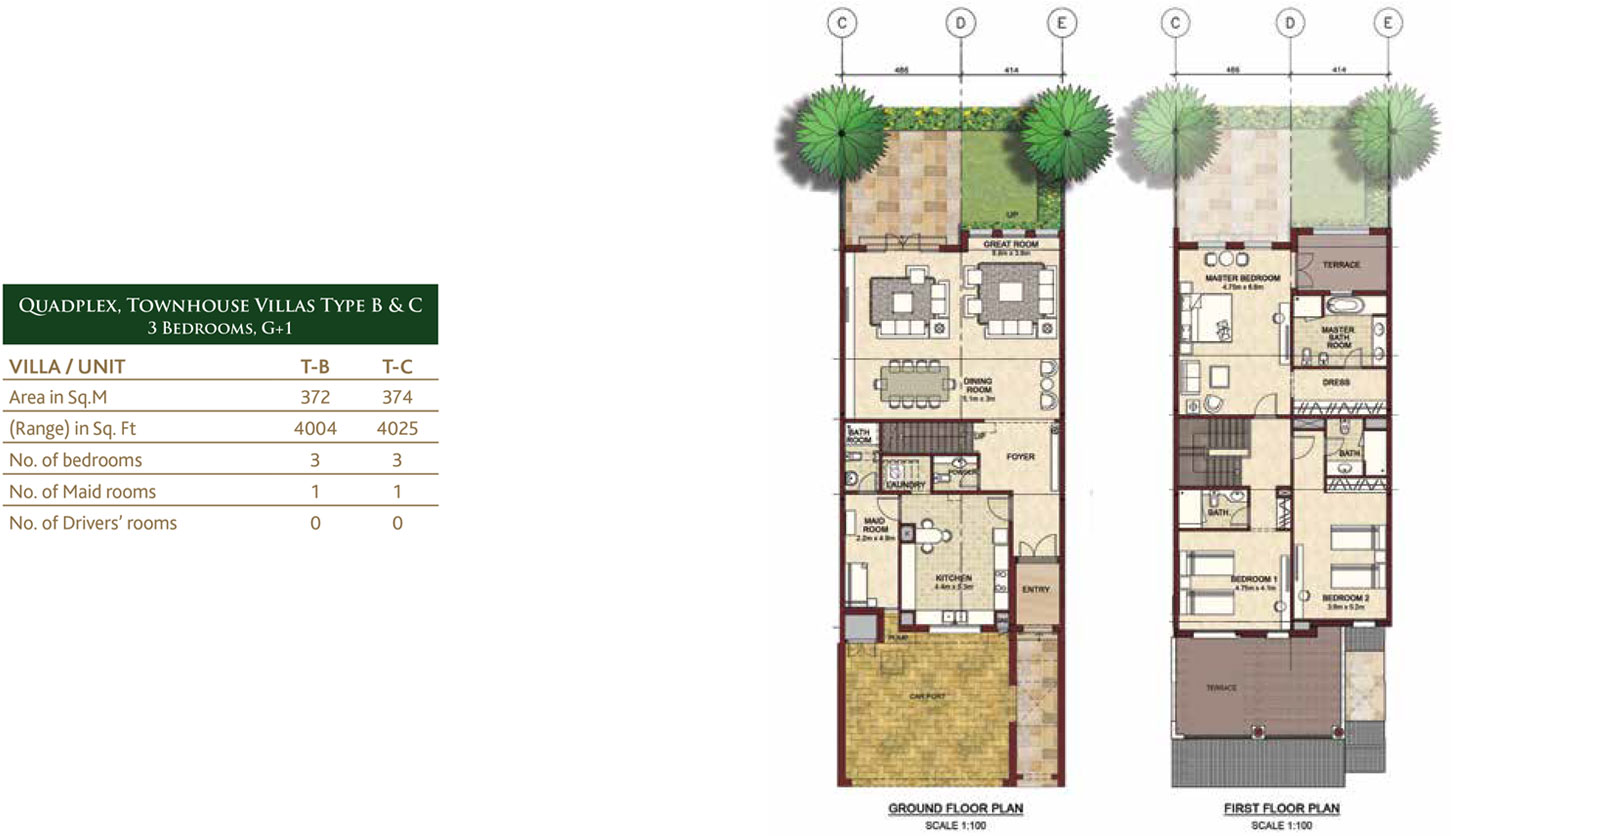 Bloom gardens phase 3 eastern corniche abu dhabi for Quadplex plans